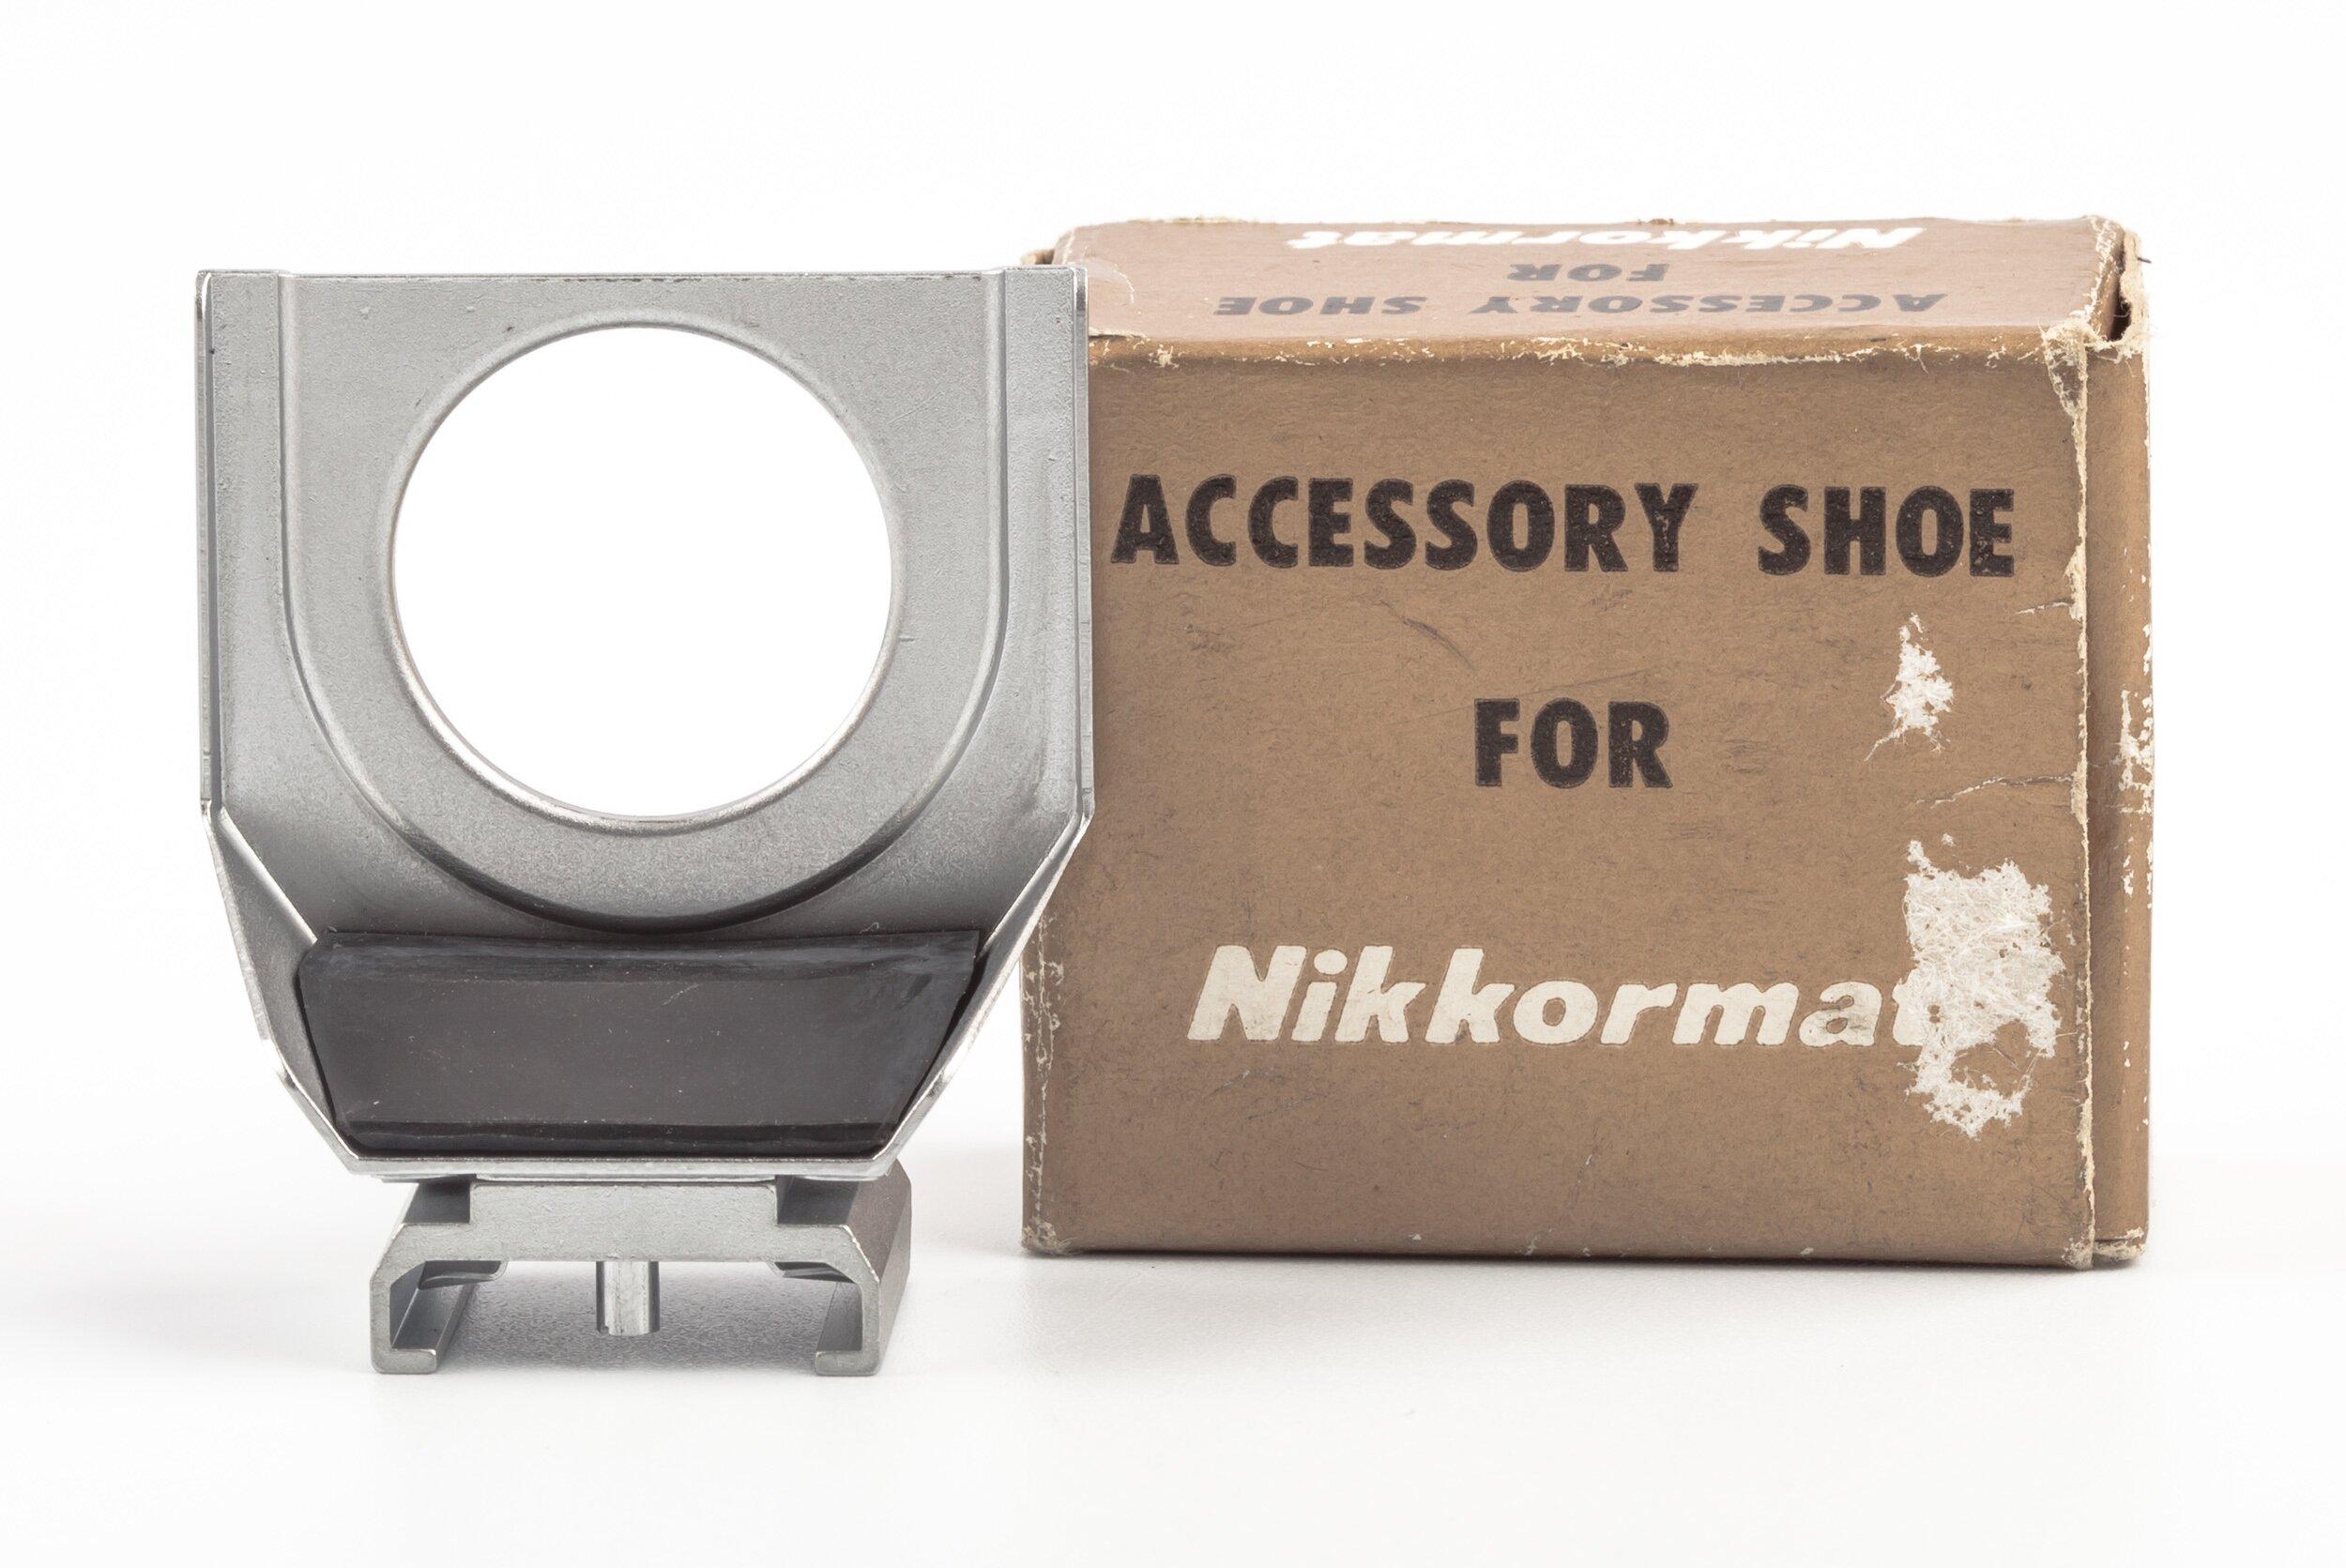 Nikon Accessory shoe for Nikkormat